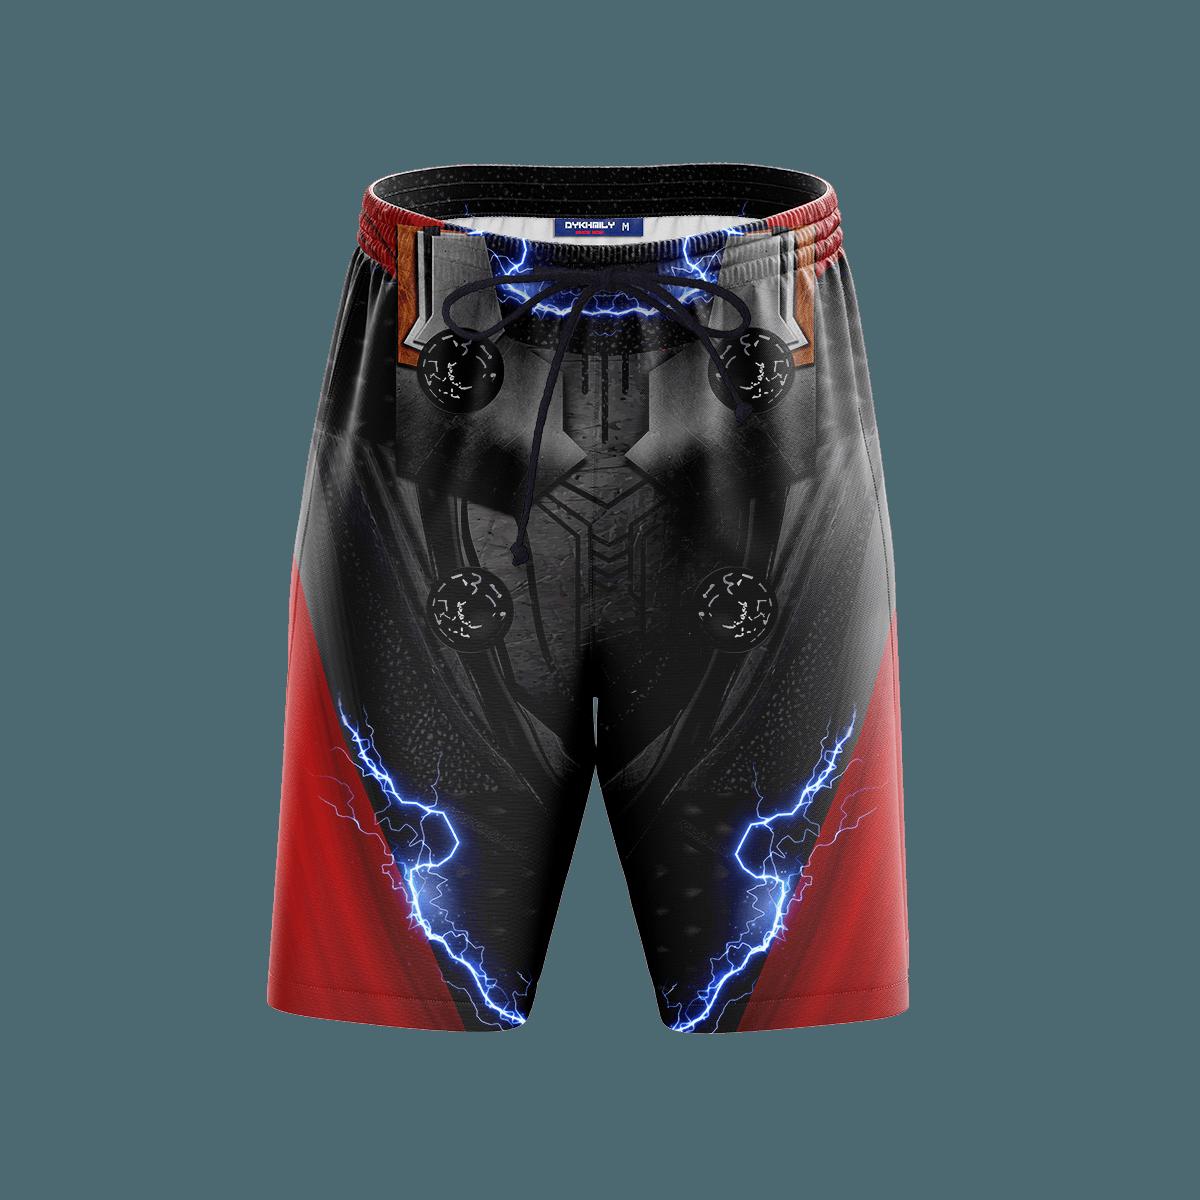 Stormbreaker Beach Shorts FDM3107 S Official Anime Swimsuit Merch